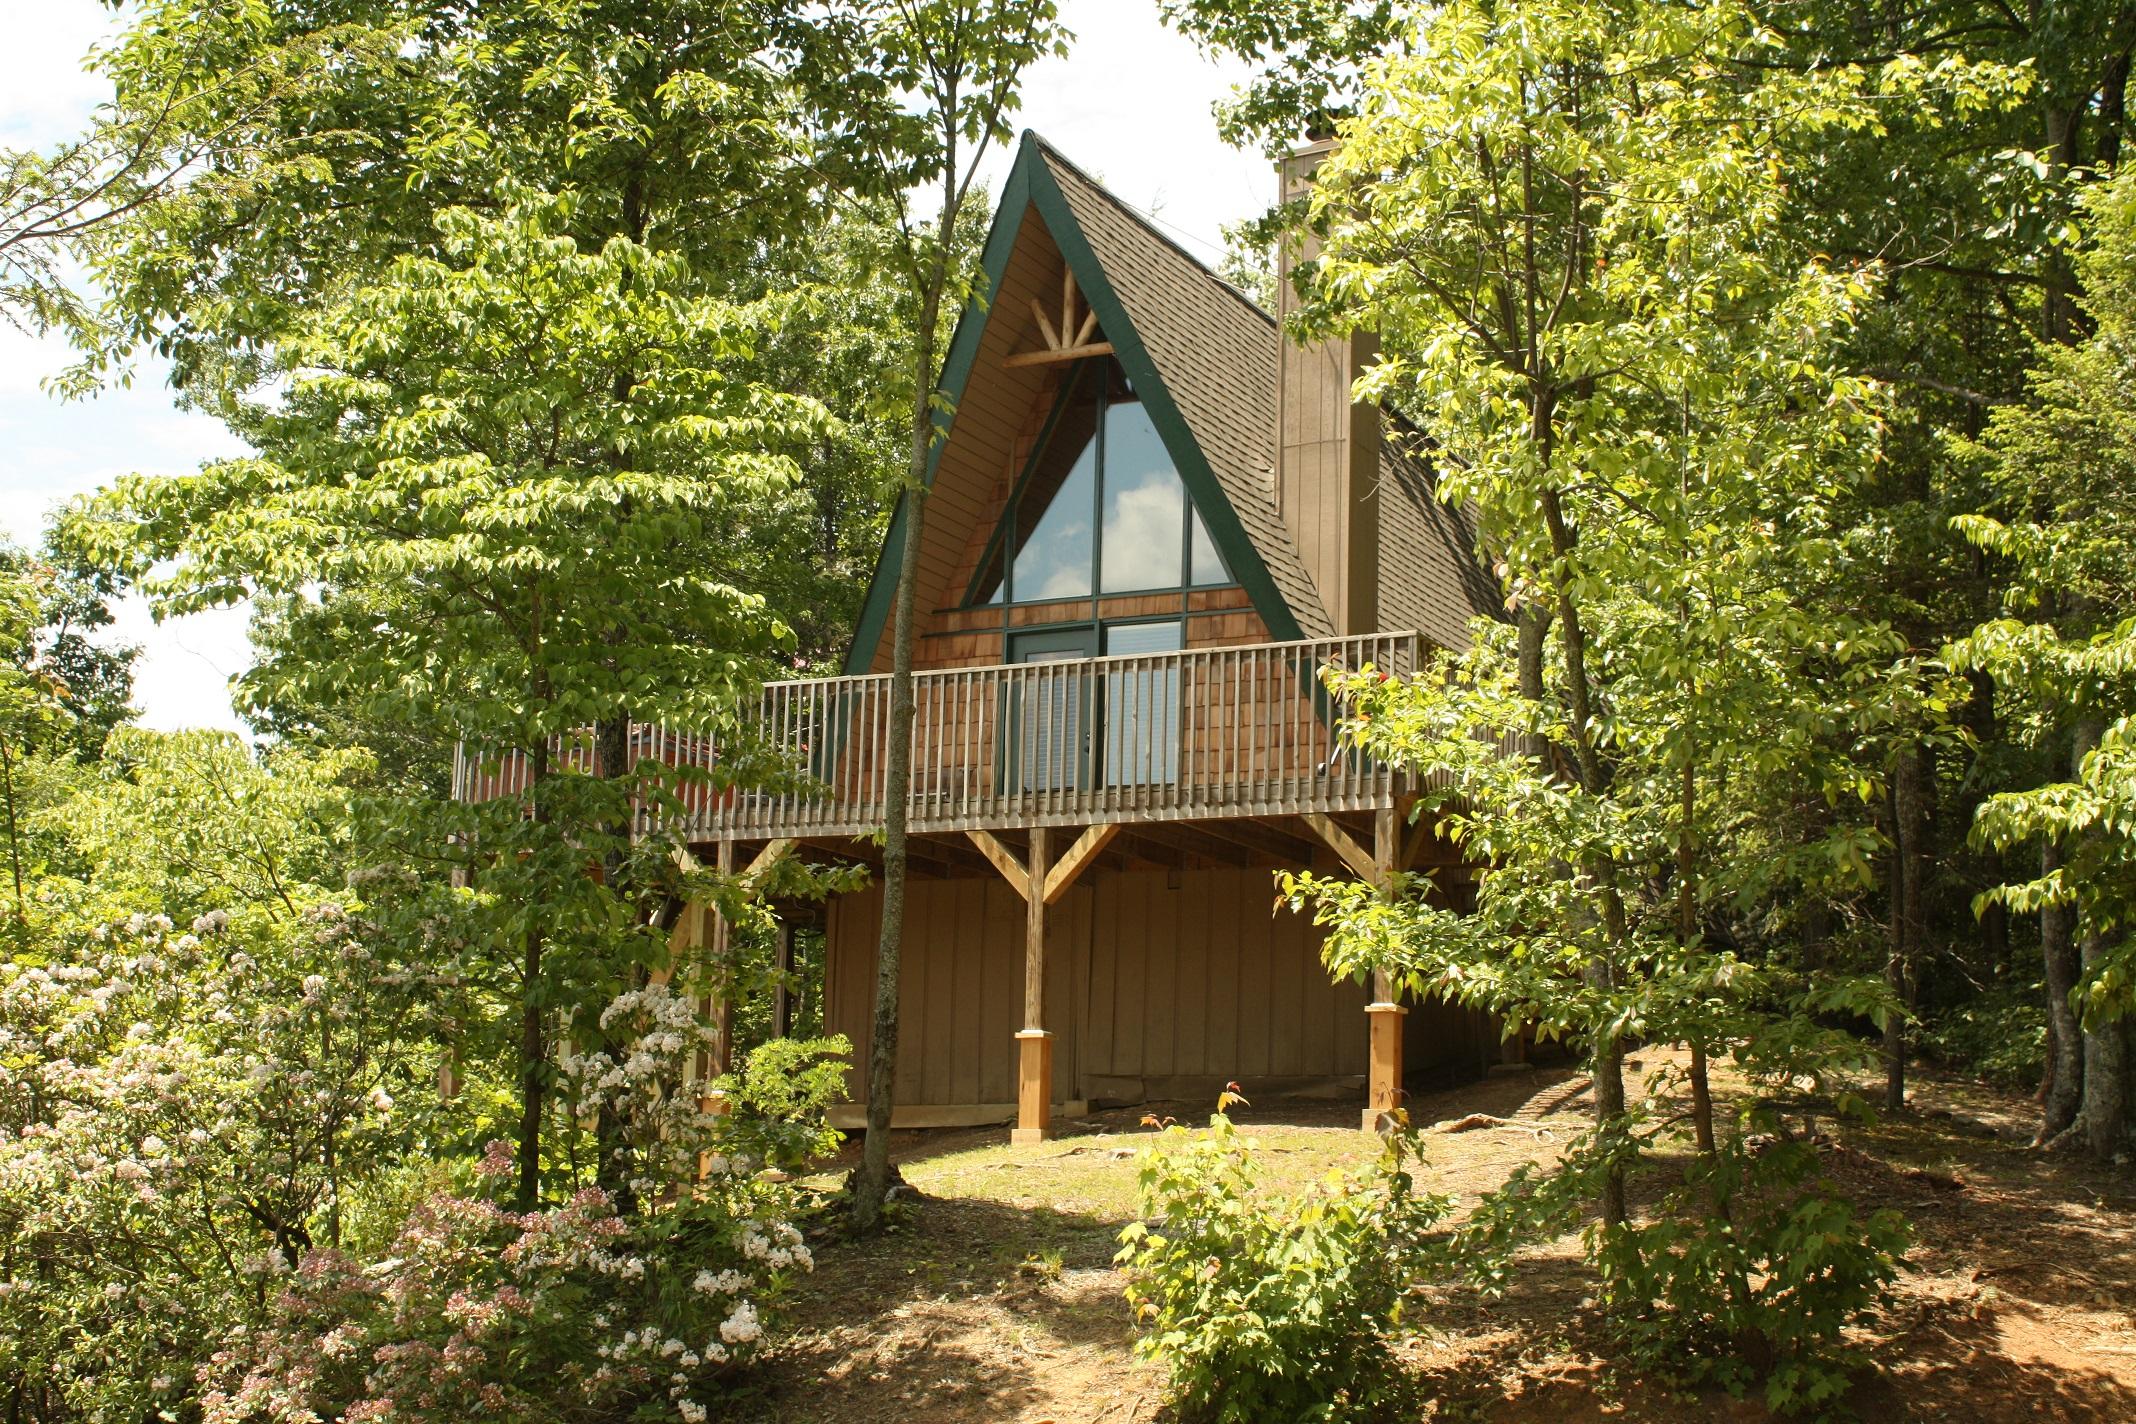 Pinetop A 1 Bedroom Cabin In Gatlinburg Tennessee Mountain Laurel Chalets Gatlinburg Cabin